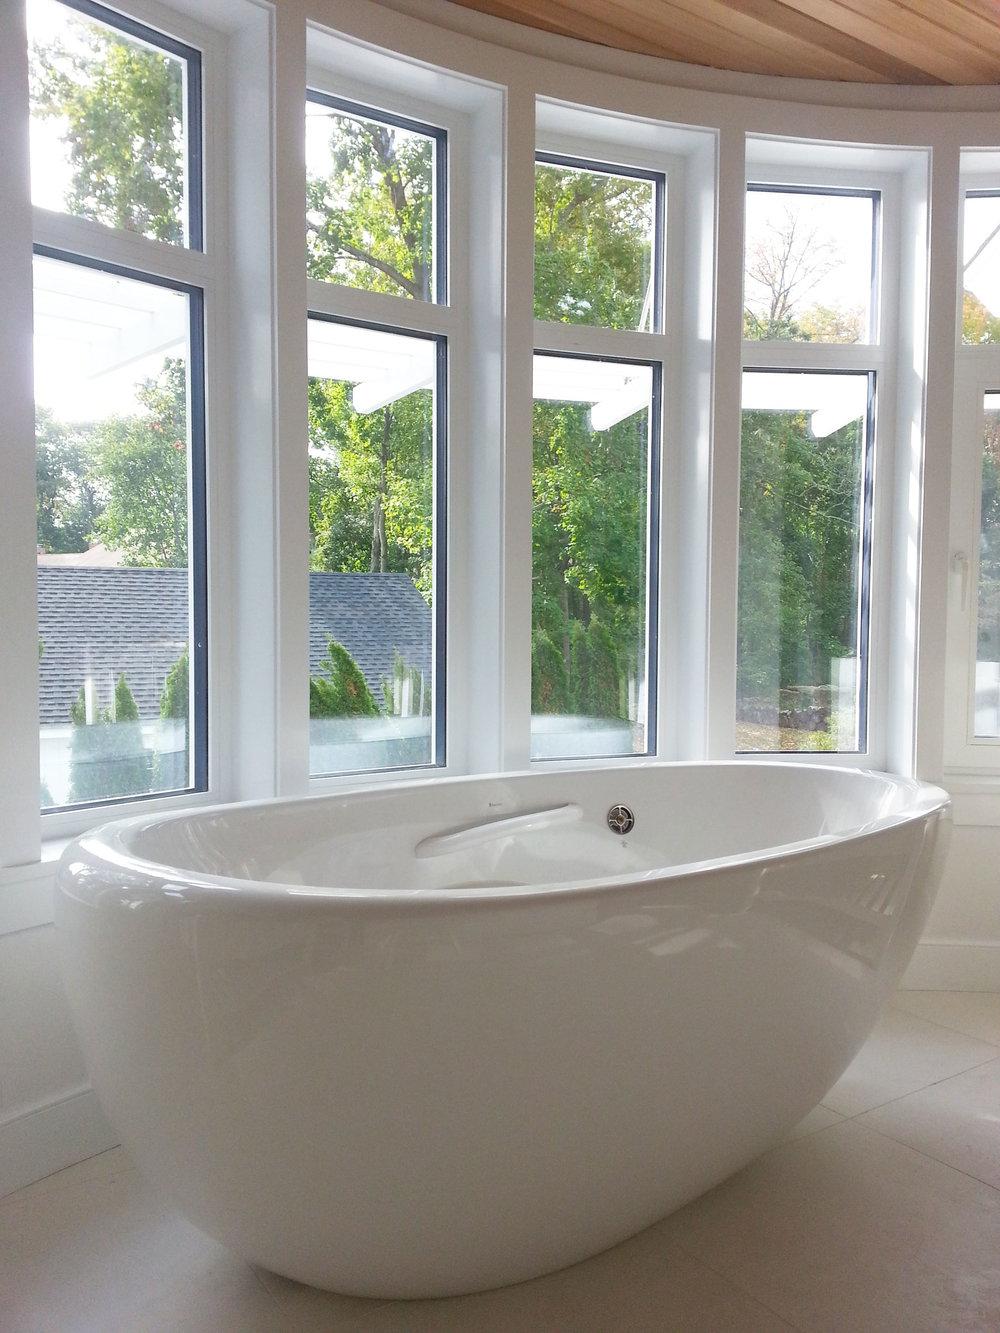 New-Canaan-net-zero-soaking-tub.jpg